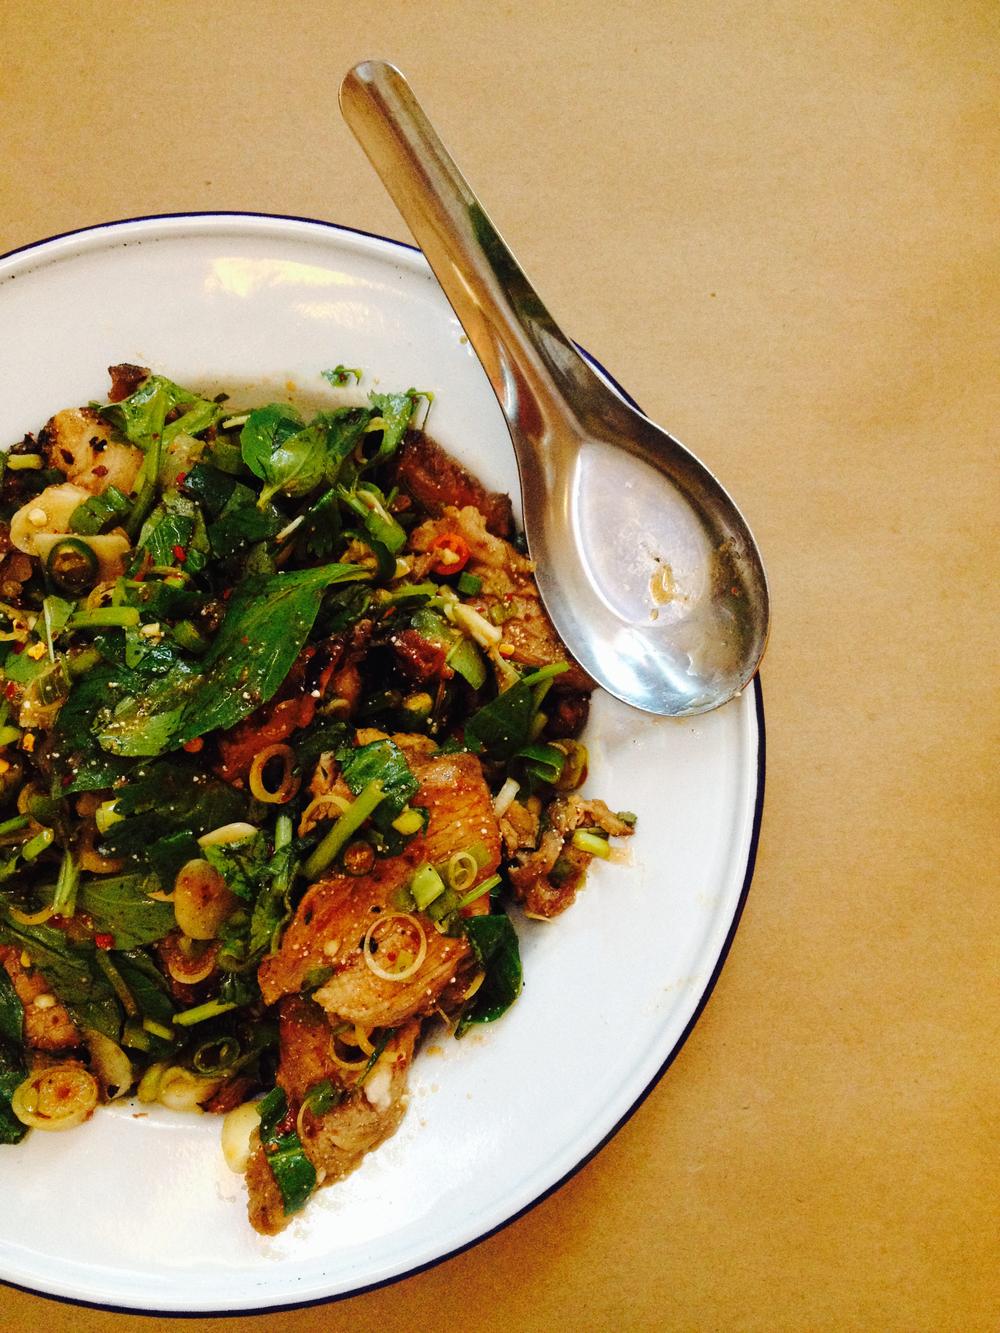 moo sadoong, or 'startled pig,' with grilled pork, basil, lemongrass, raw garlic, fish sauce, lime, chile